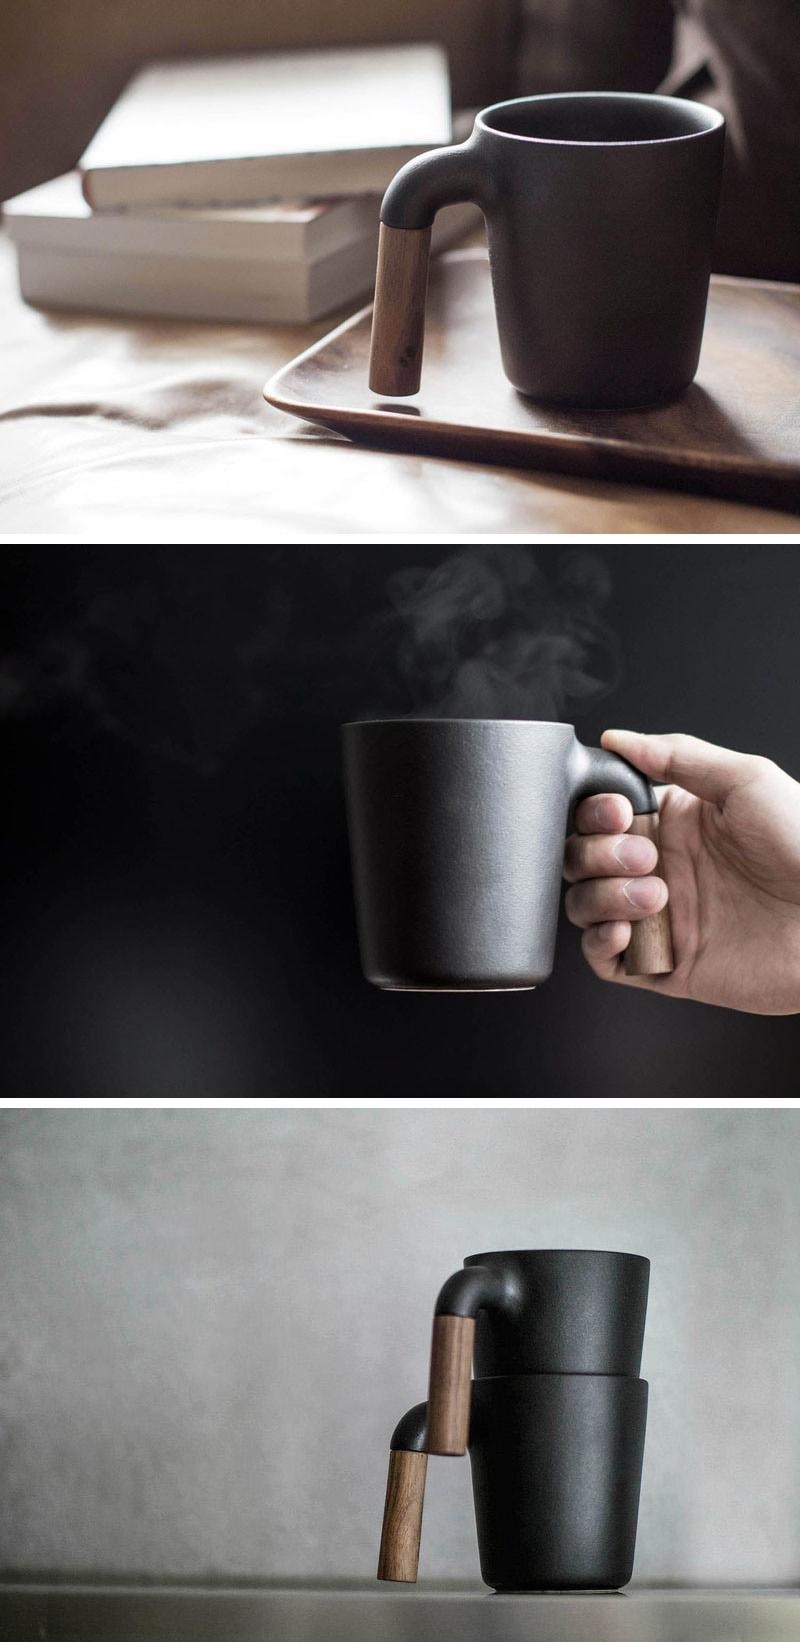 This modern matte black glazed Japanese ceramic mug is an easy to carry mug with a sturdy walnut wood handle.